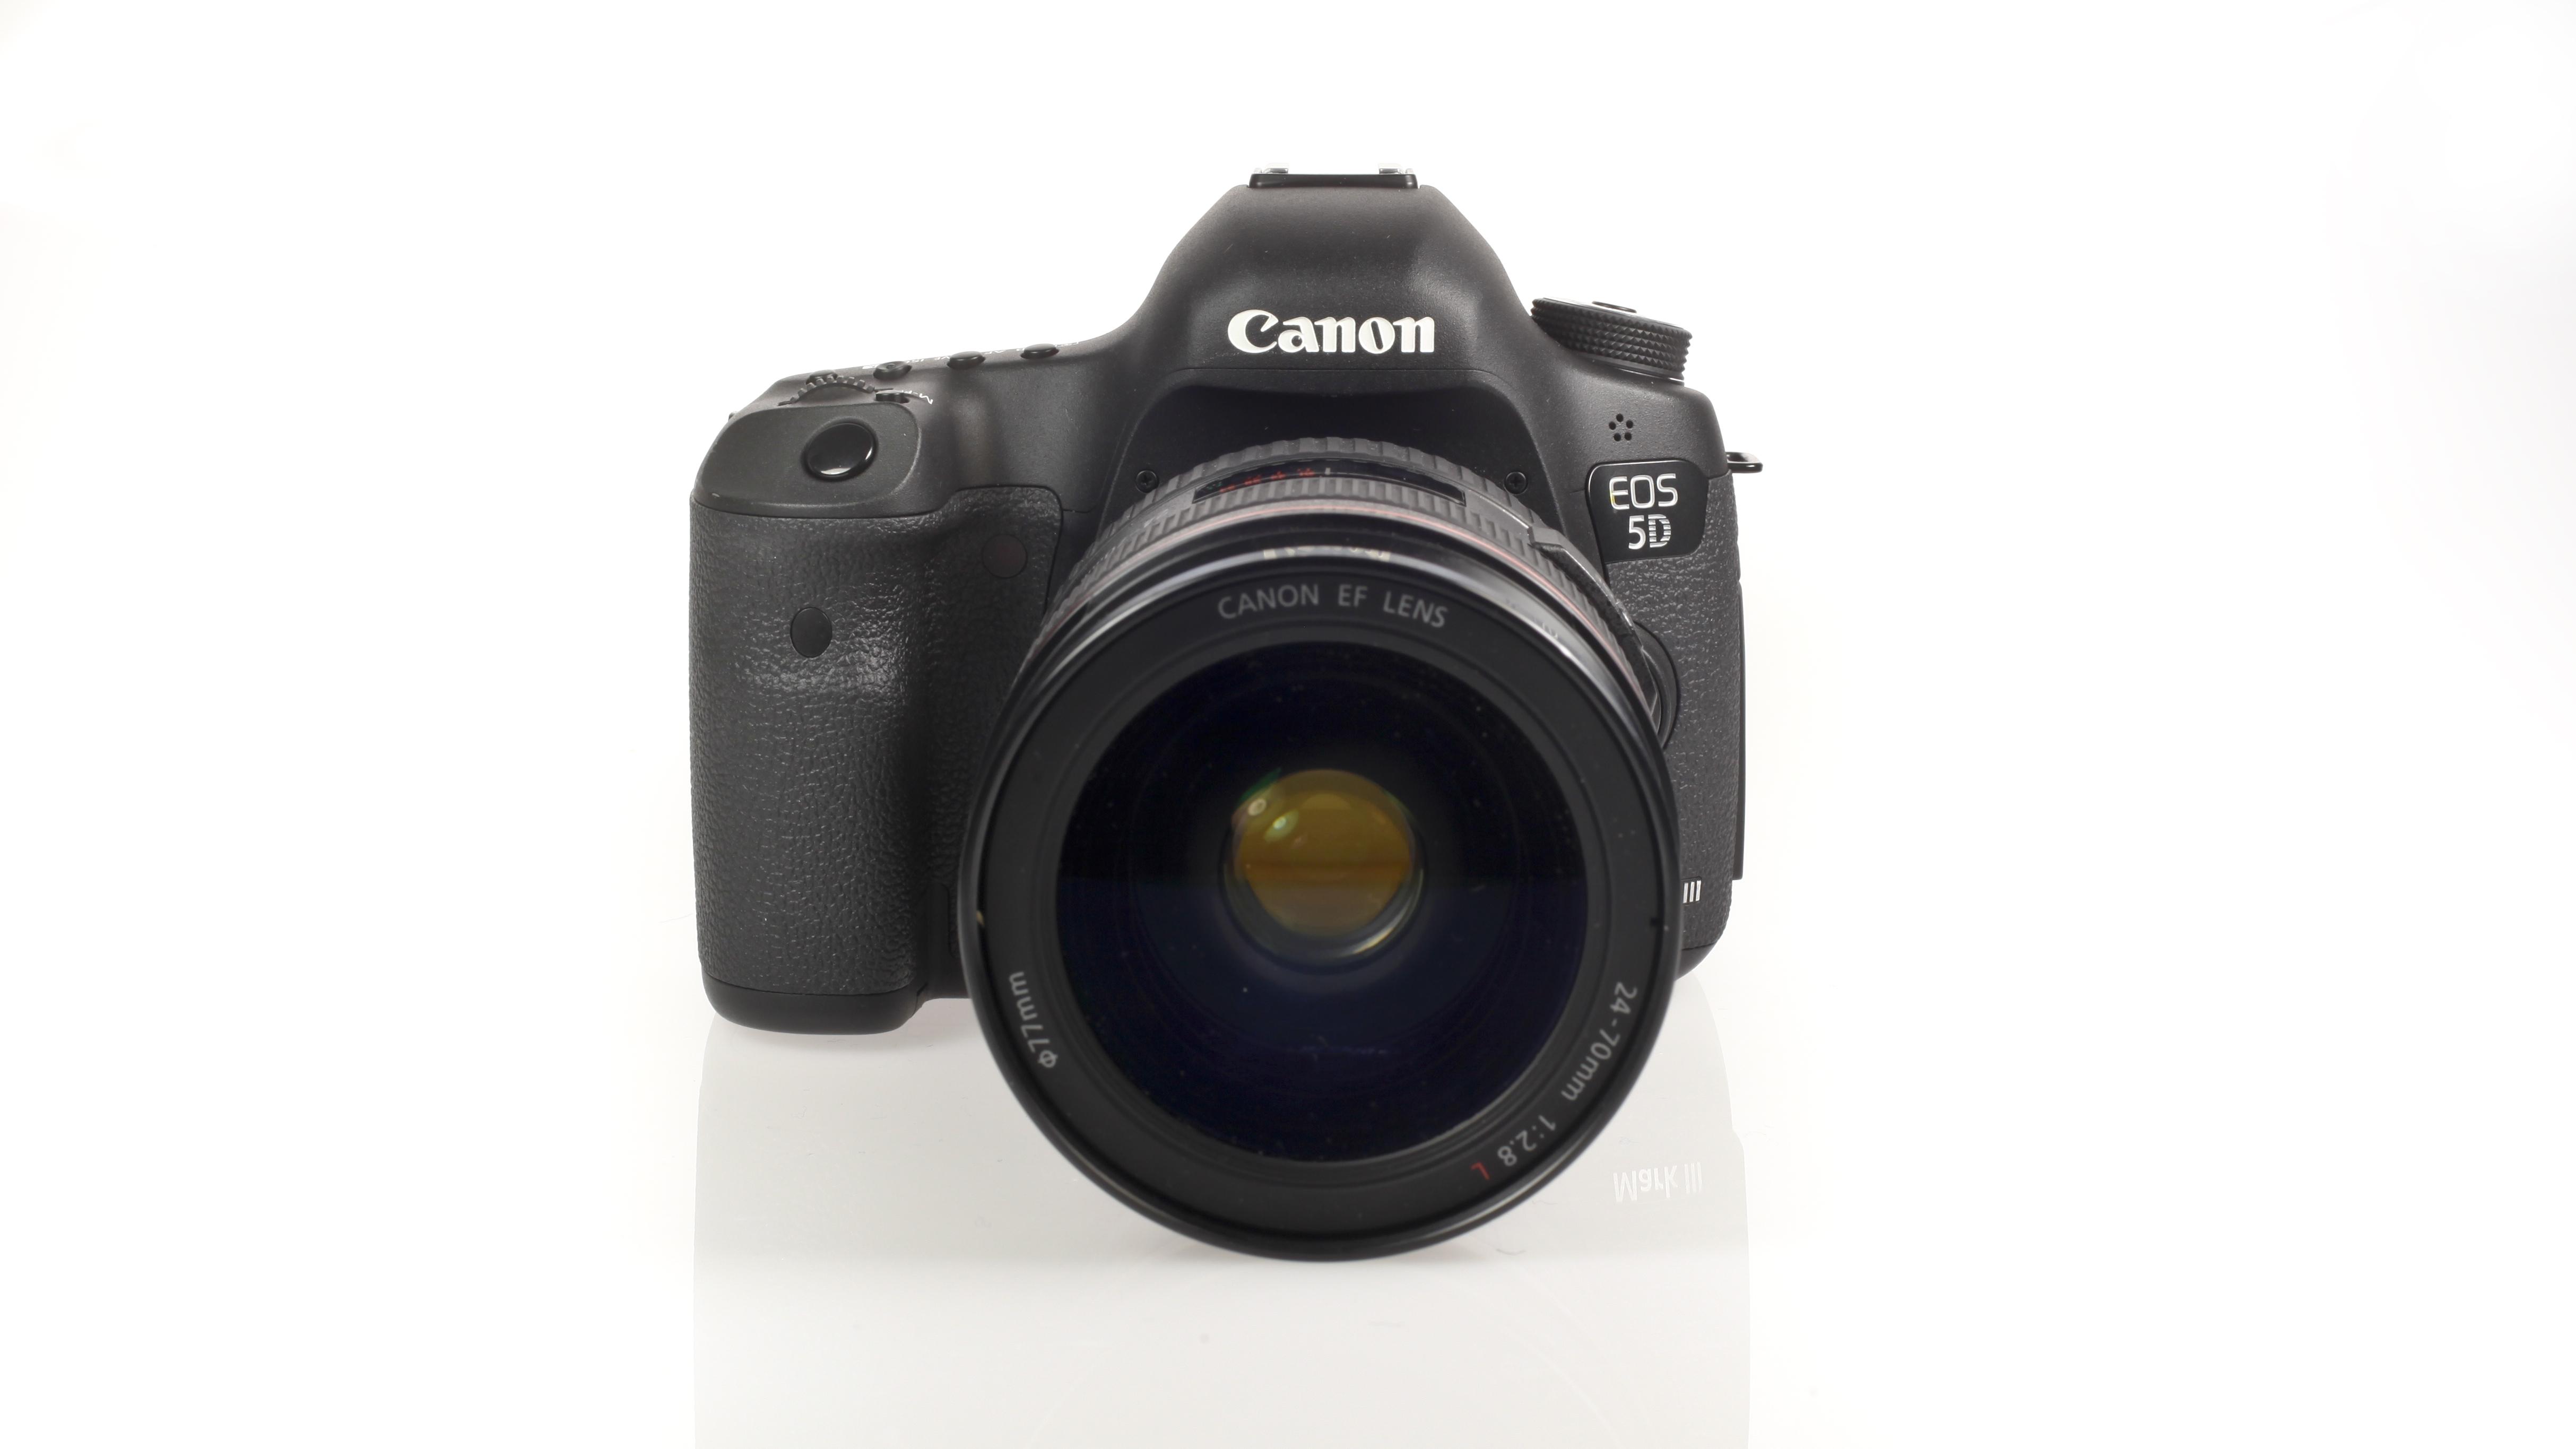 Canon 5D Mark III Vs Nikon D800